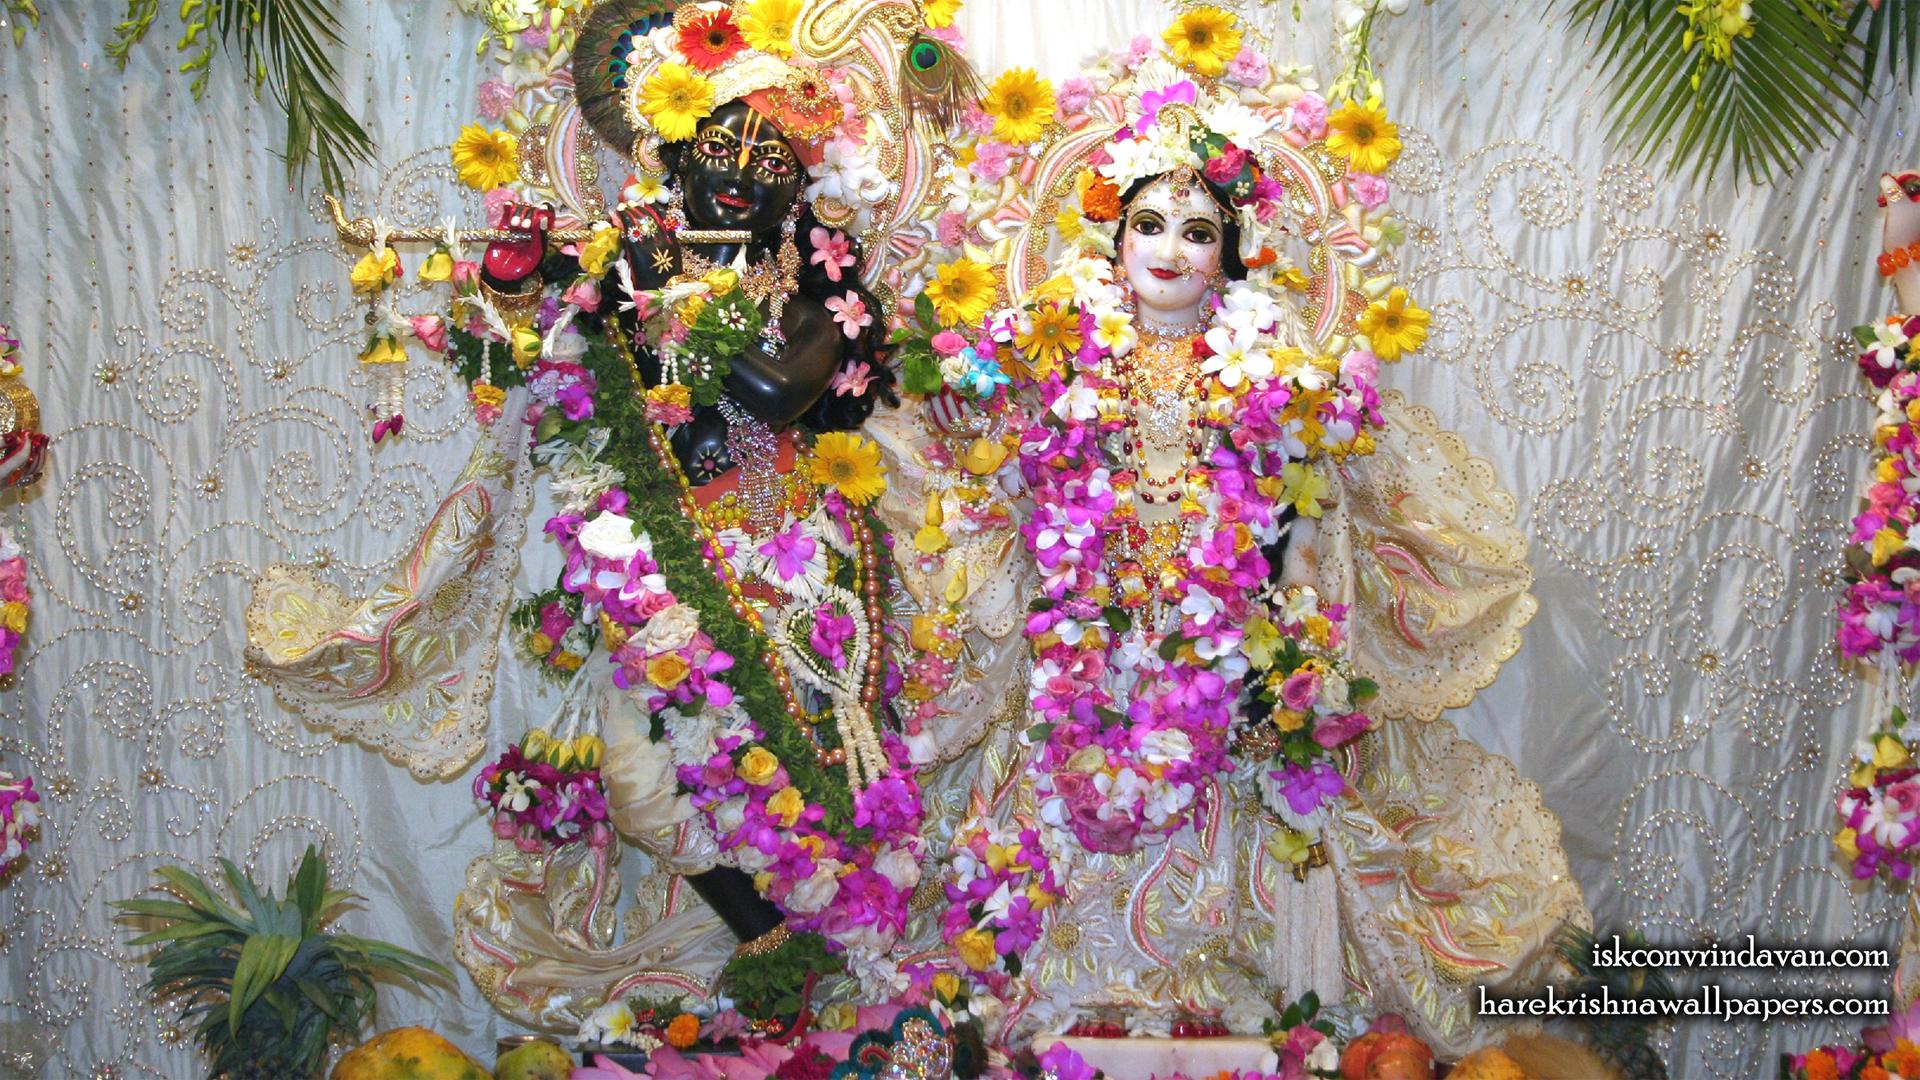 Sri Sri Radha Shyamsundar Wallpaper (006) Size 1920x1080 Download